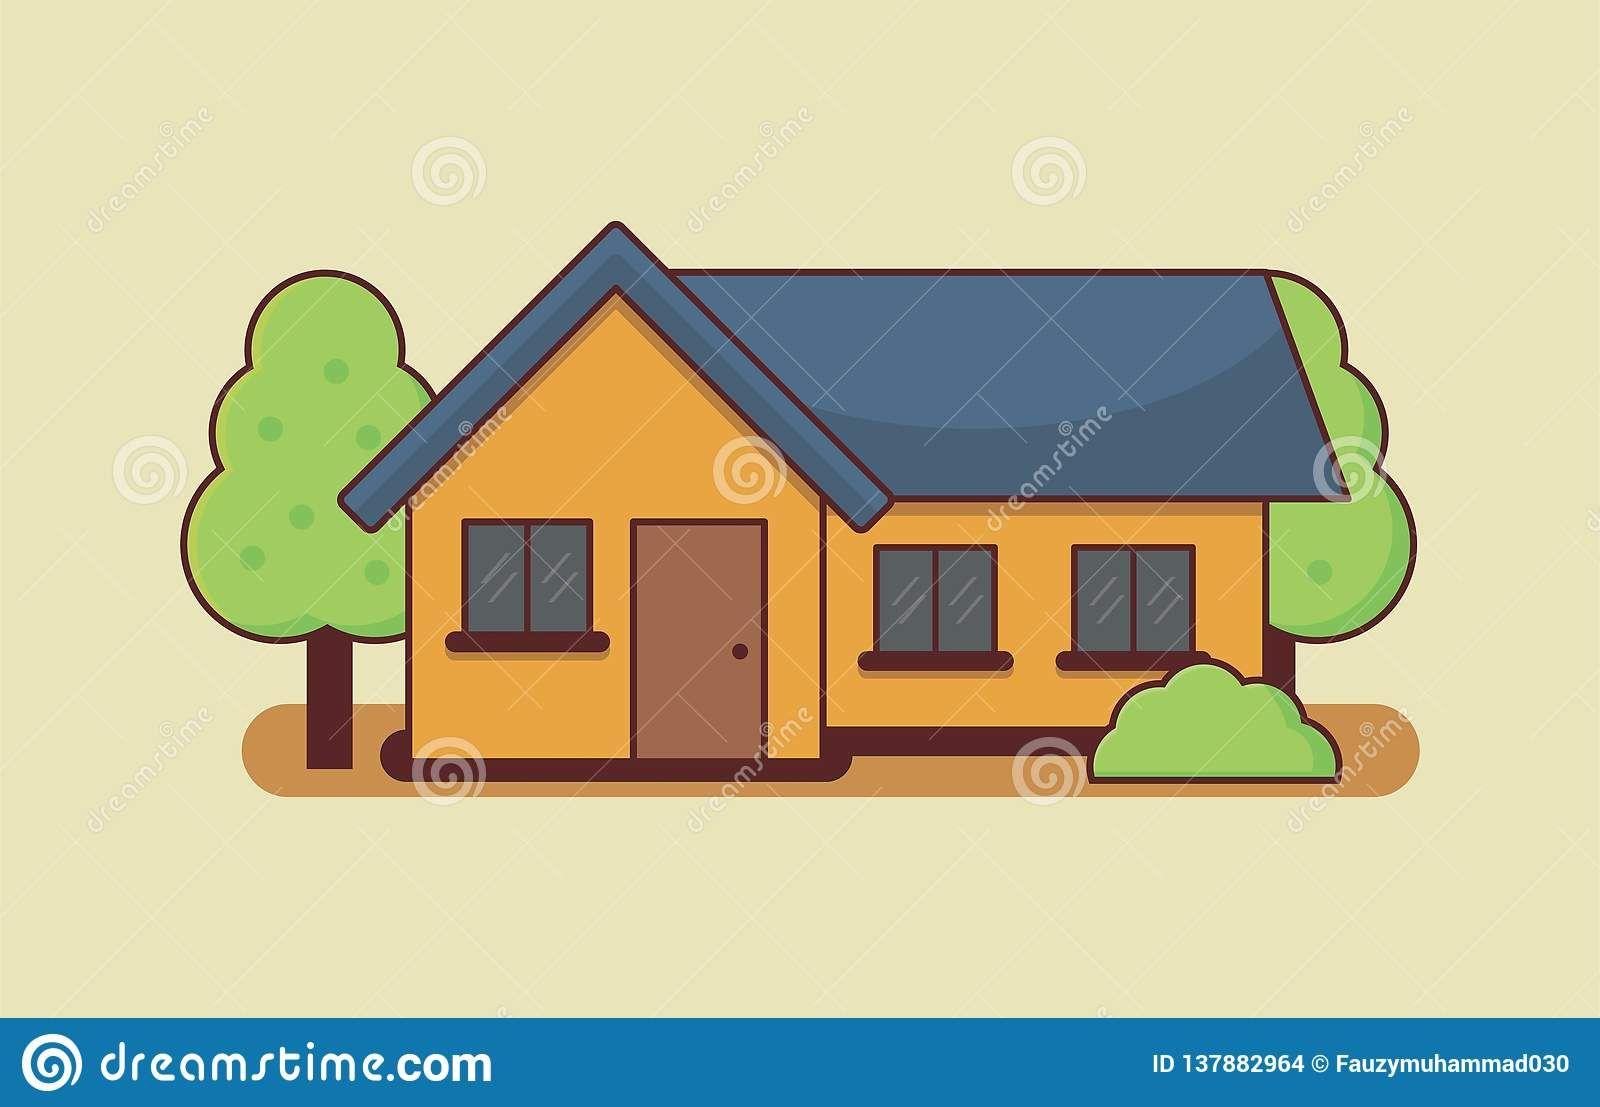 Simple House Design Cartoon In 2020 Simple House Design House Design Photos Simple House